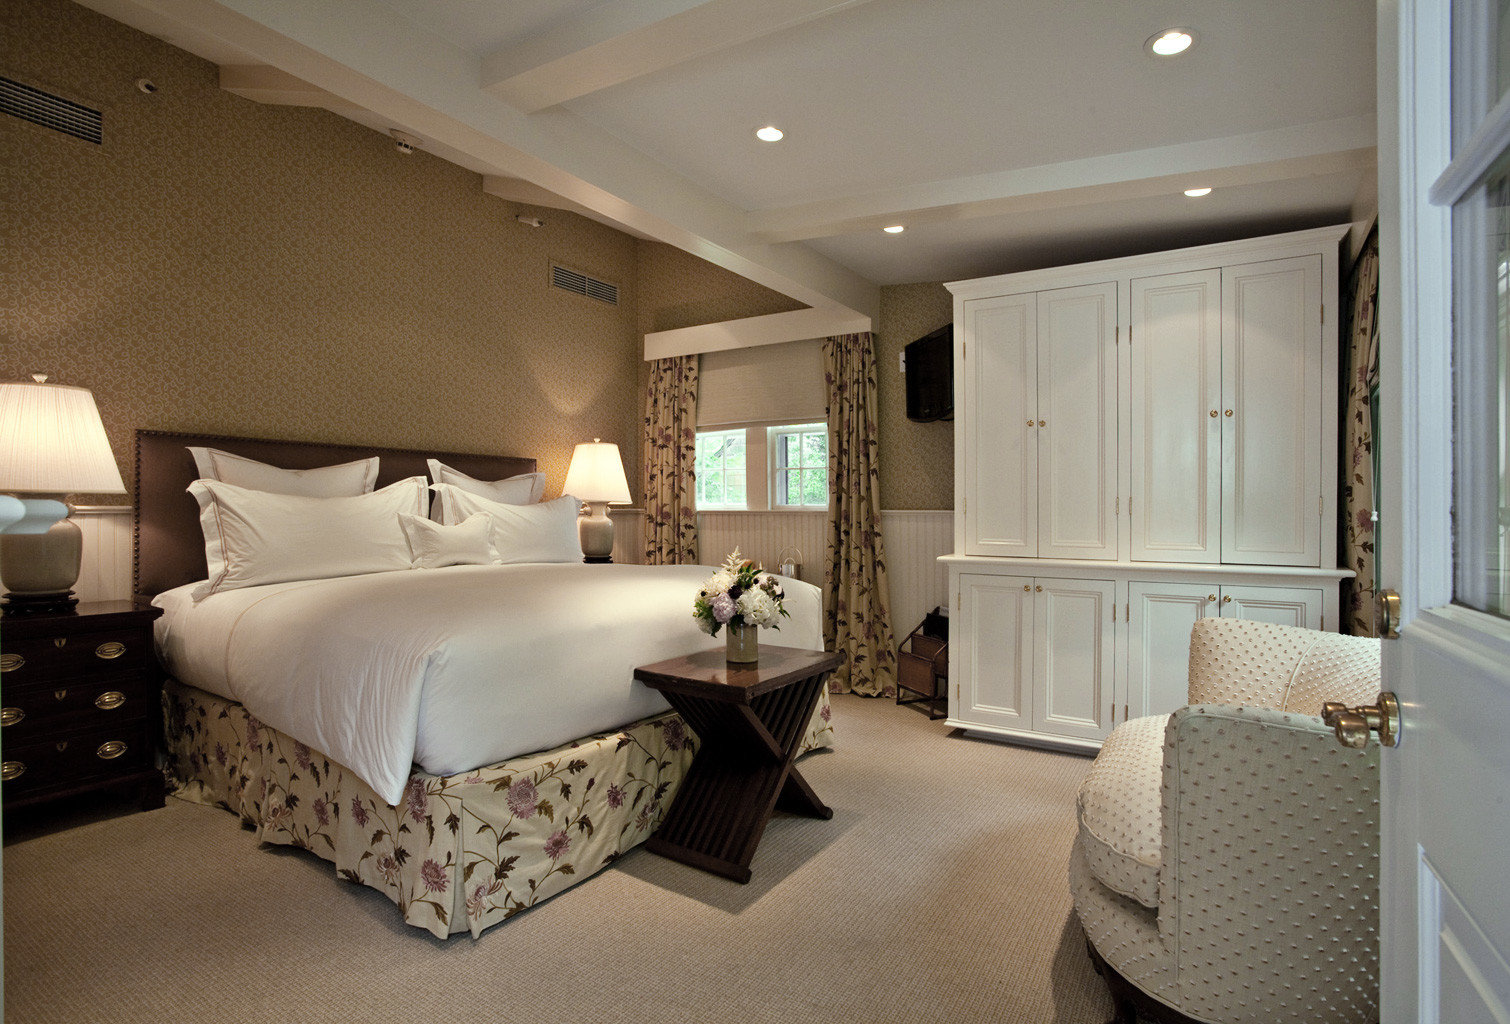 Beach Bedroom Boutique Inn Romance Romantic property vehicle passenger ship yacht Suite home living room Boat cottage